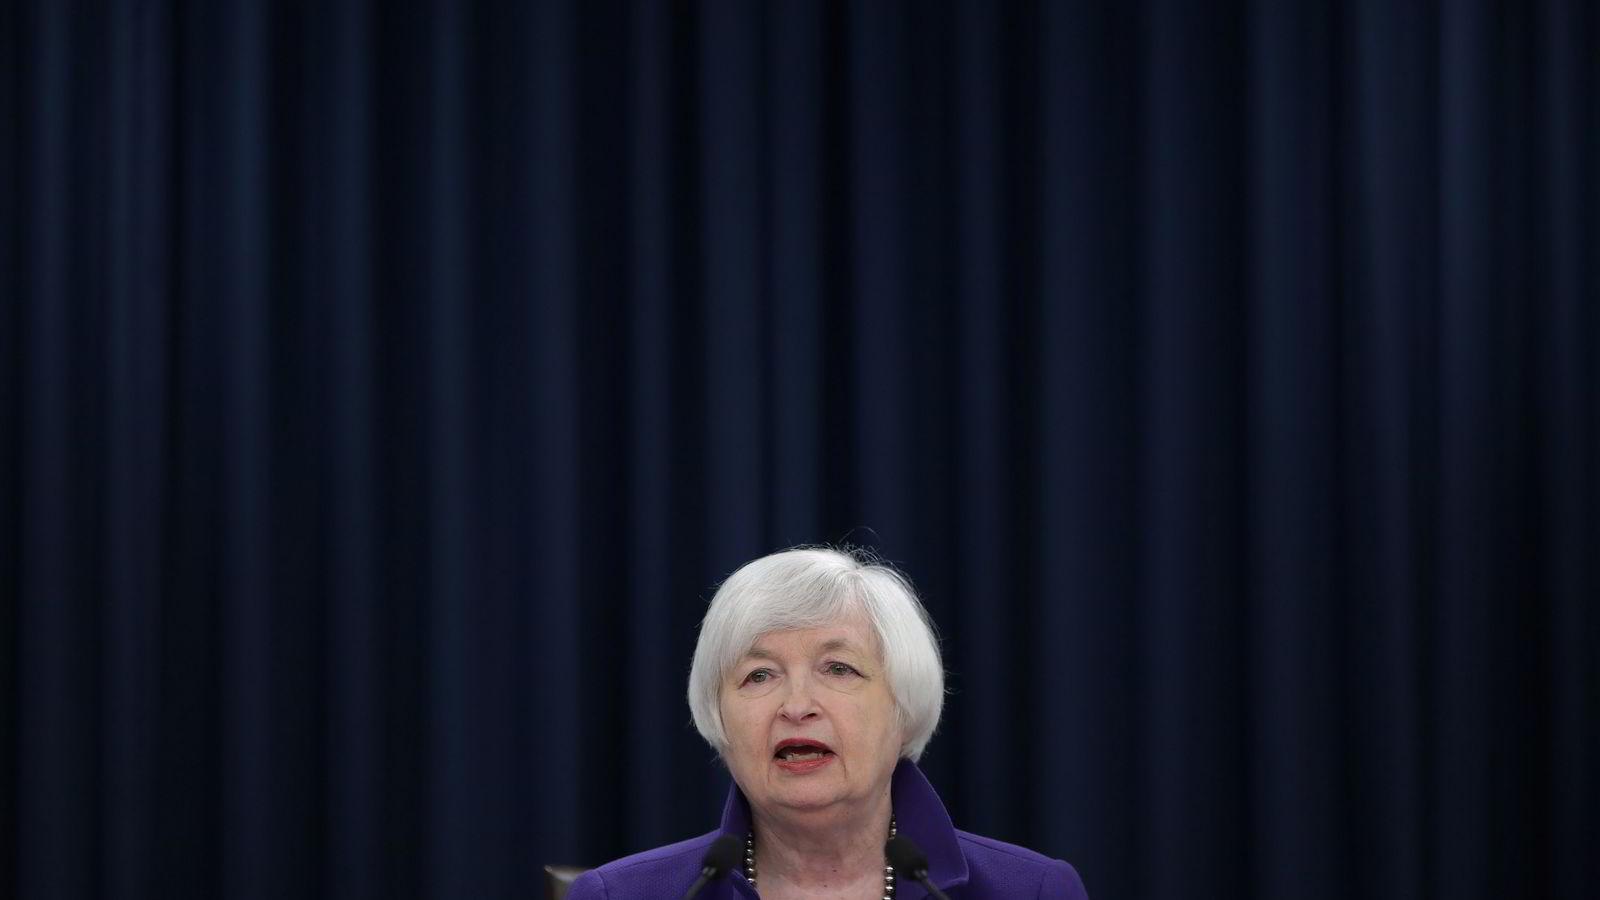 USAs sentralbanksjef Janet Yellen på onsdagens pressekonferanse.